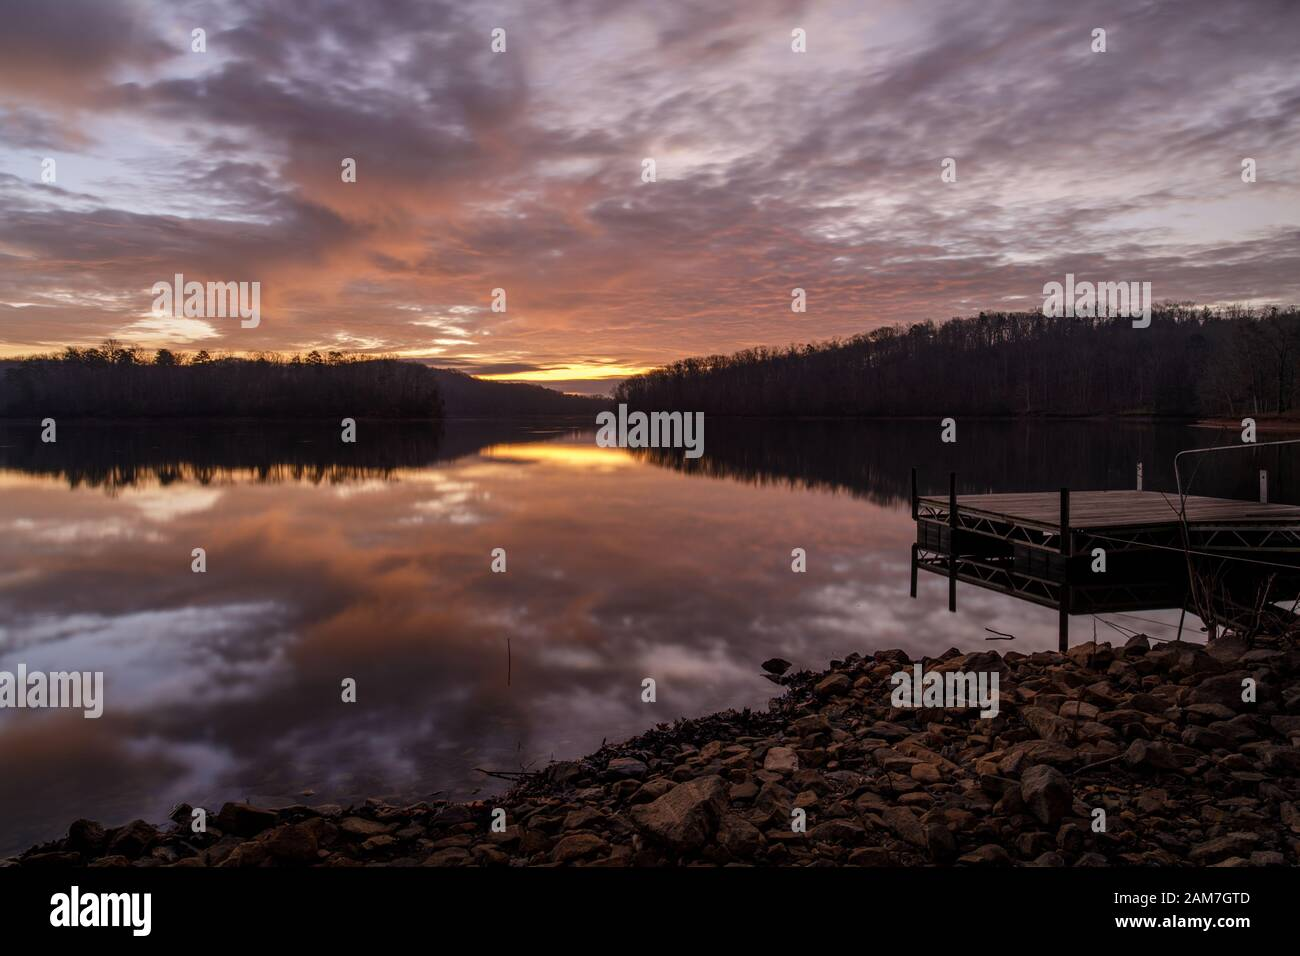 Sunrise Reflection - Lake Sidney Lanier. Beautiful December sunrise duplicated in the water's surface at Wahoo Creek Park. Sunrise Reflection - Lake S Stock Photo